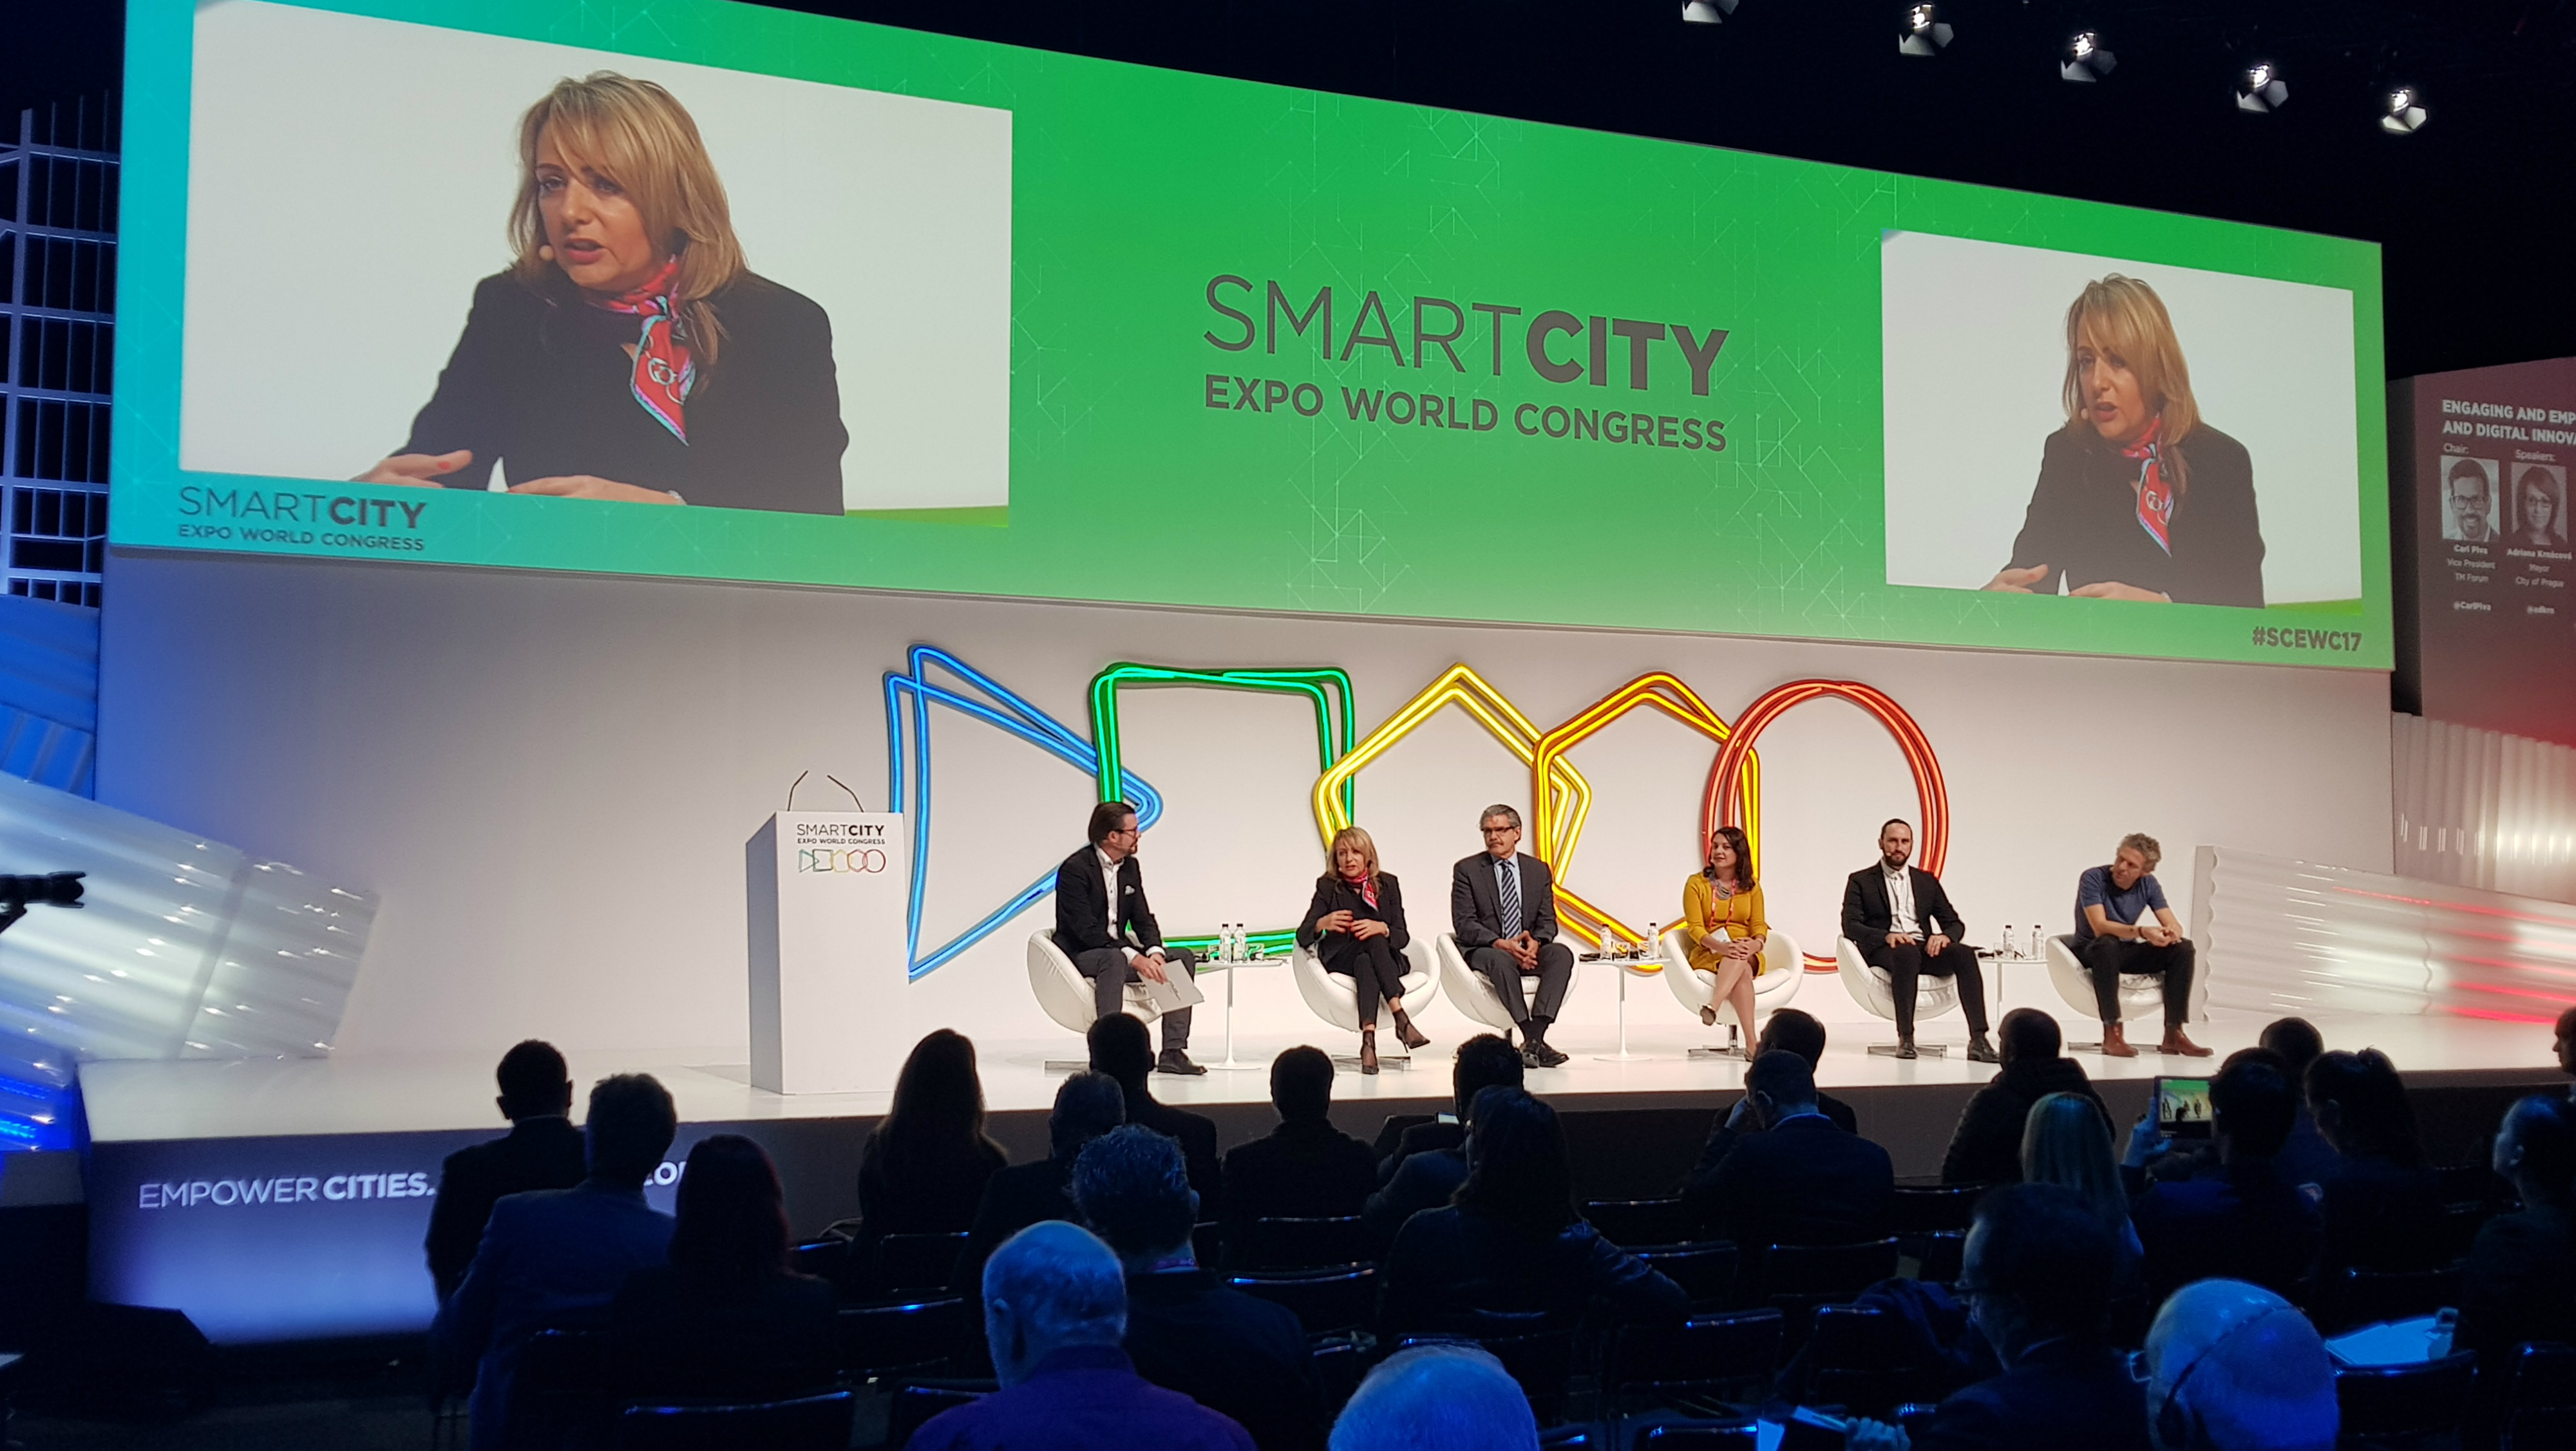 image-primatorka-na-smart-city-expo-world-congress